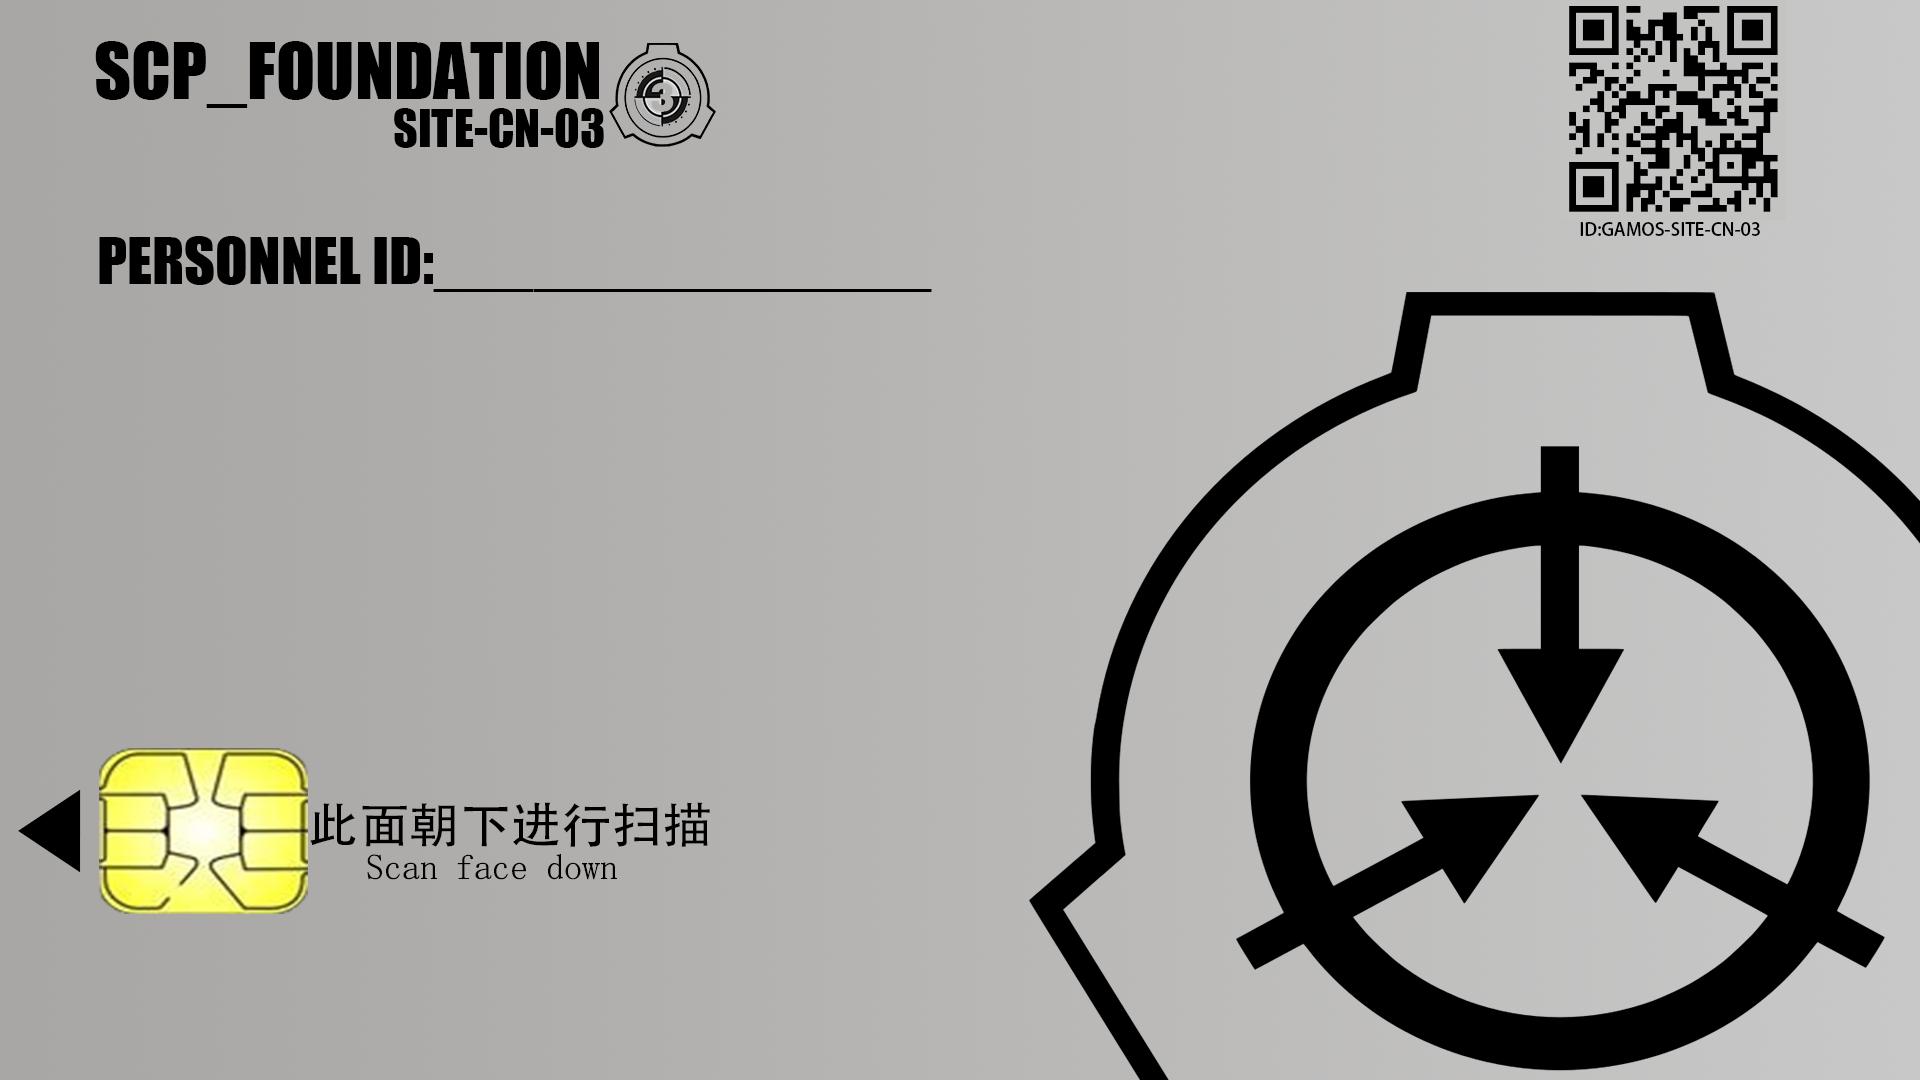 ID%20card%20-%20%E5%89%AF%E6%9C%AC.png